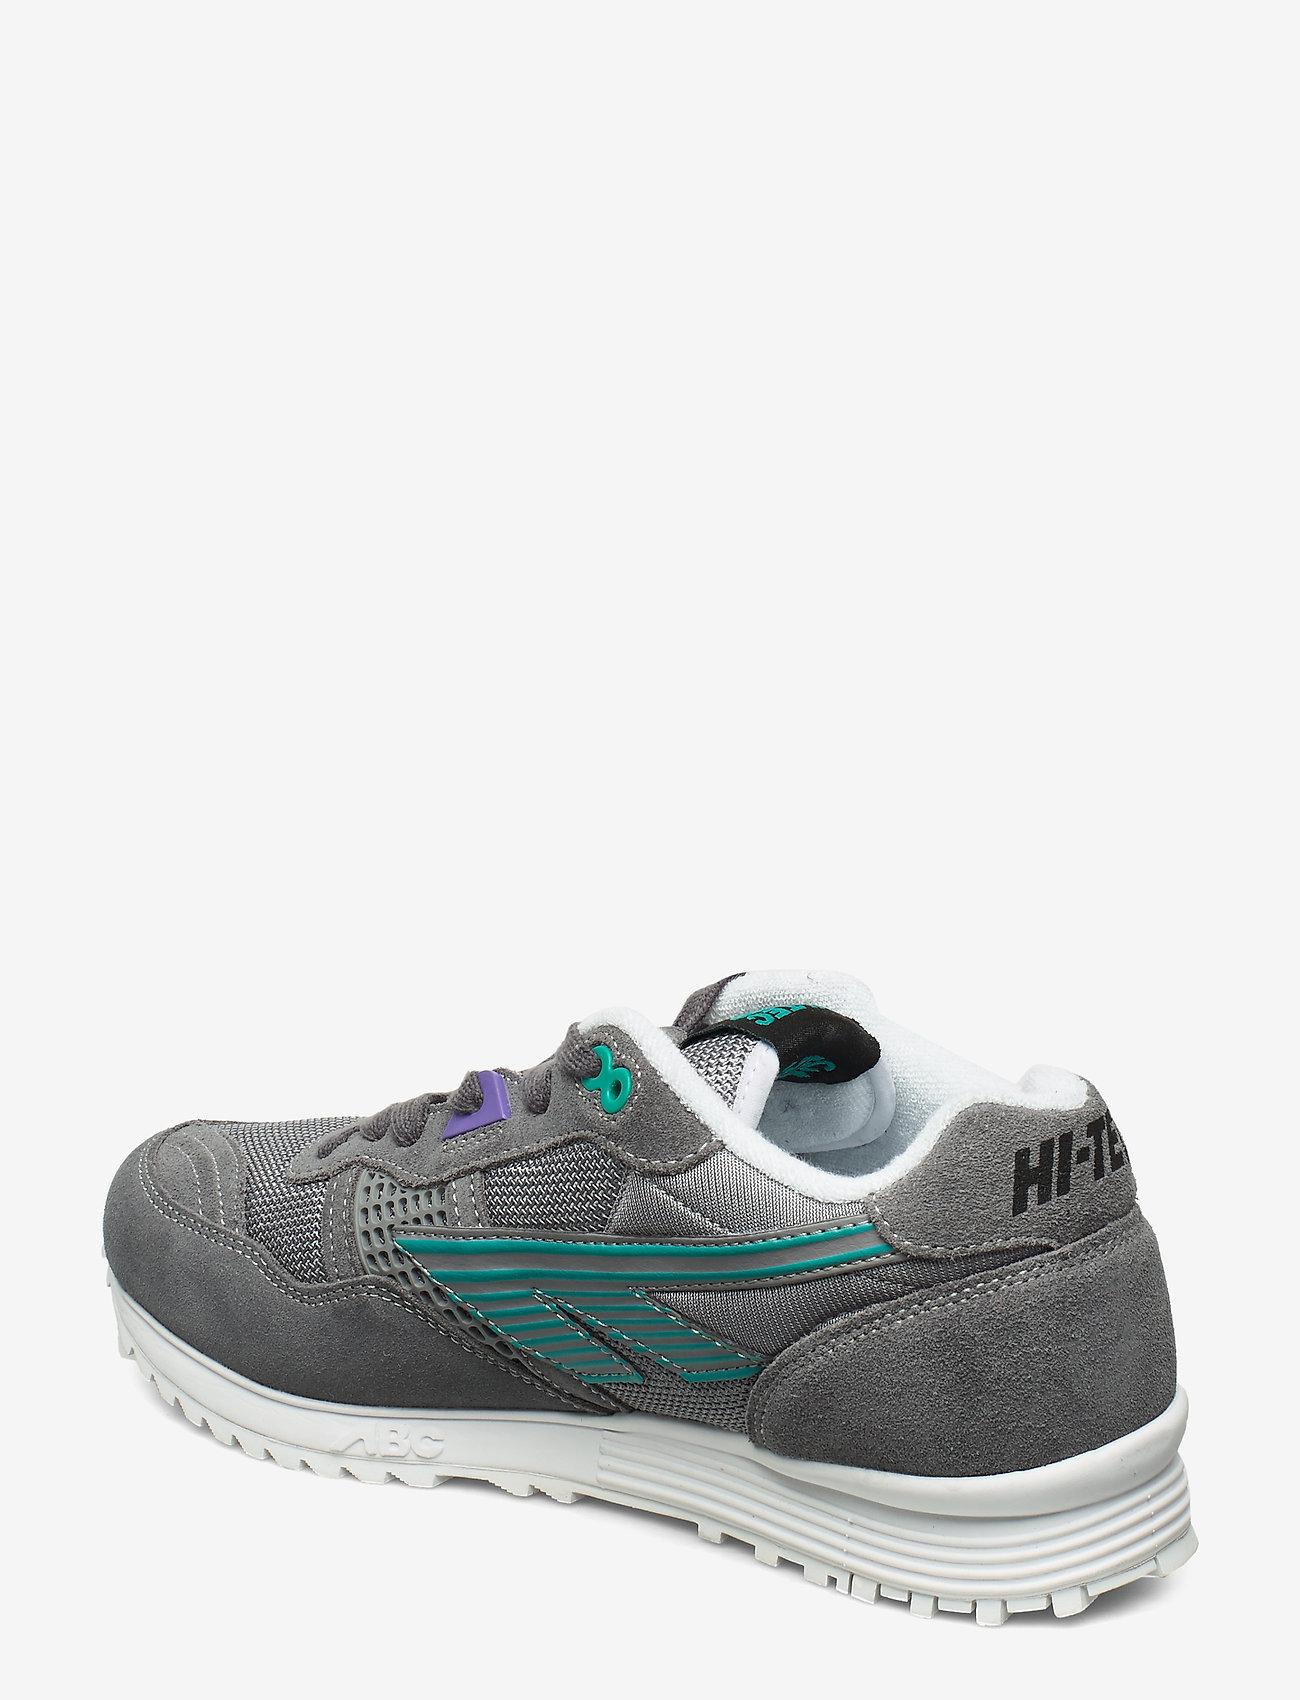 Ht Bw 146 Frost Grey/teal/purple (Grey/teal/purple) (60 €) - Hi-Tec sIuULF1a